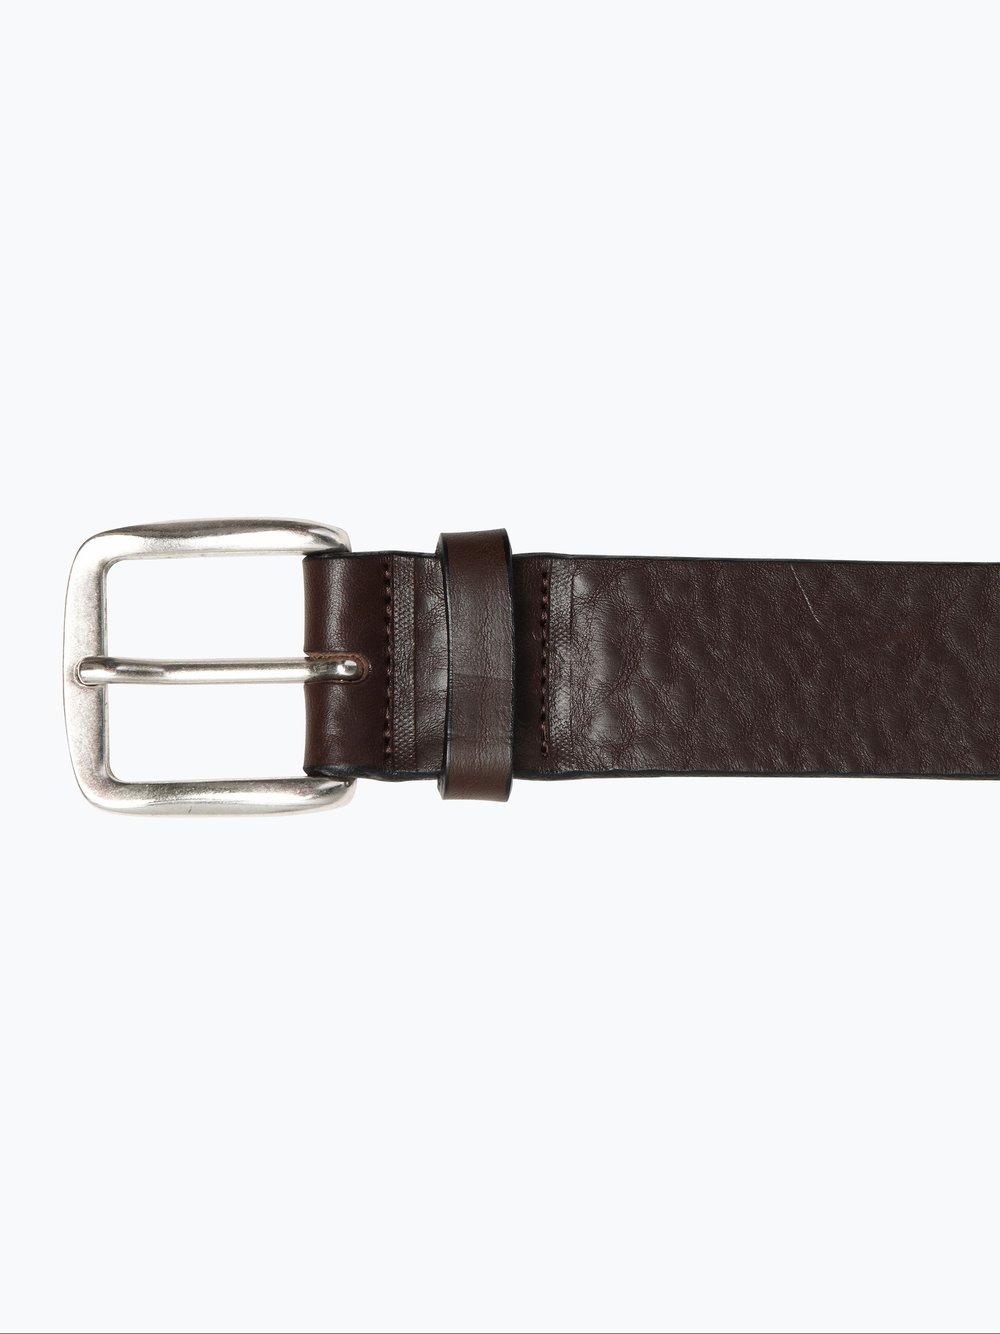 Condor – Męski pasek skórzany, brązowy Van Graaf 103460-0001-01150